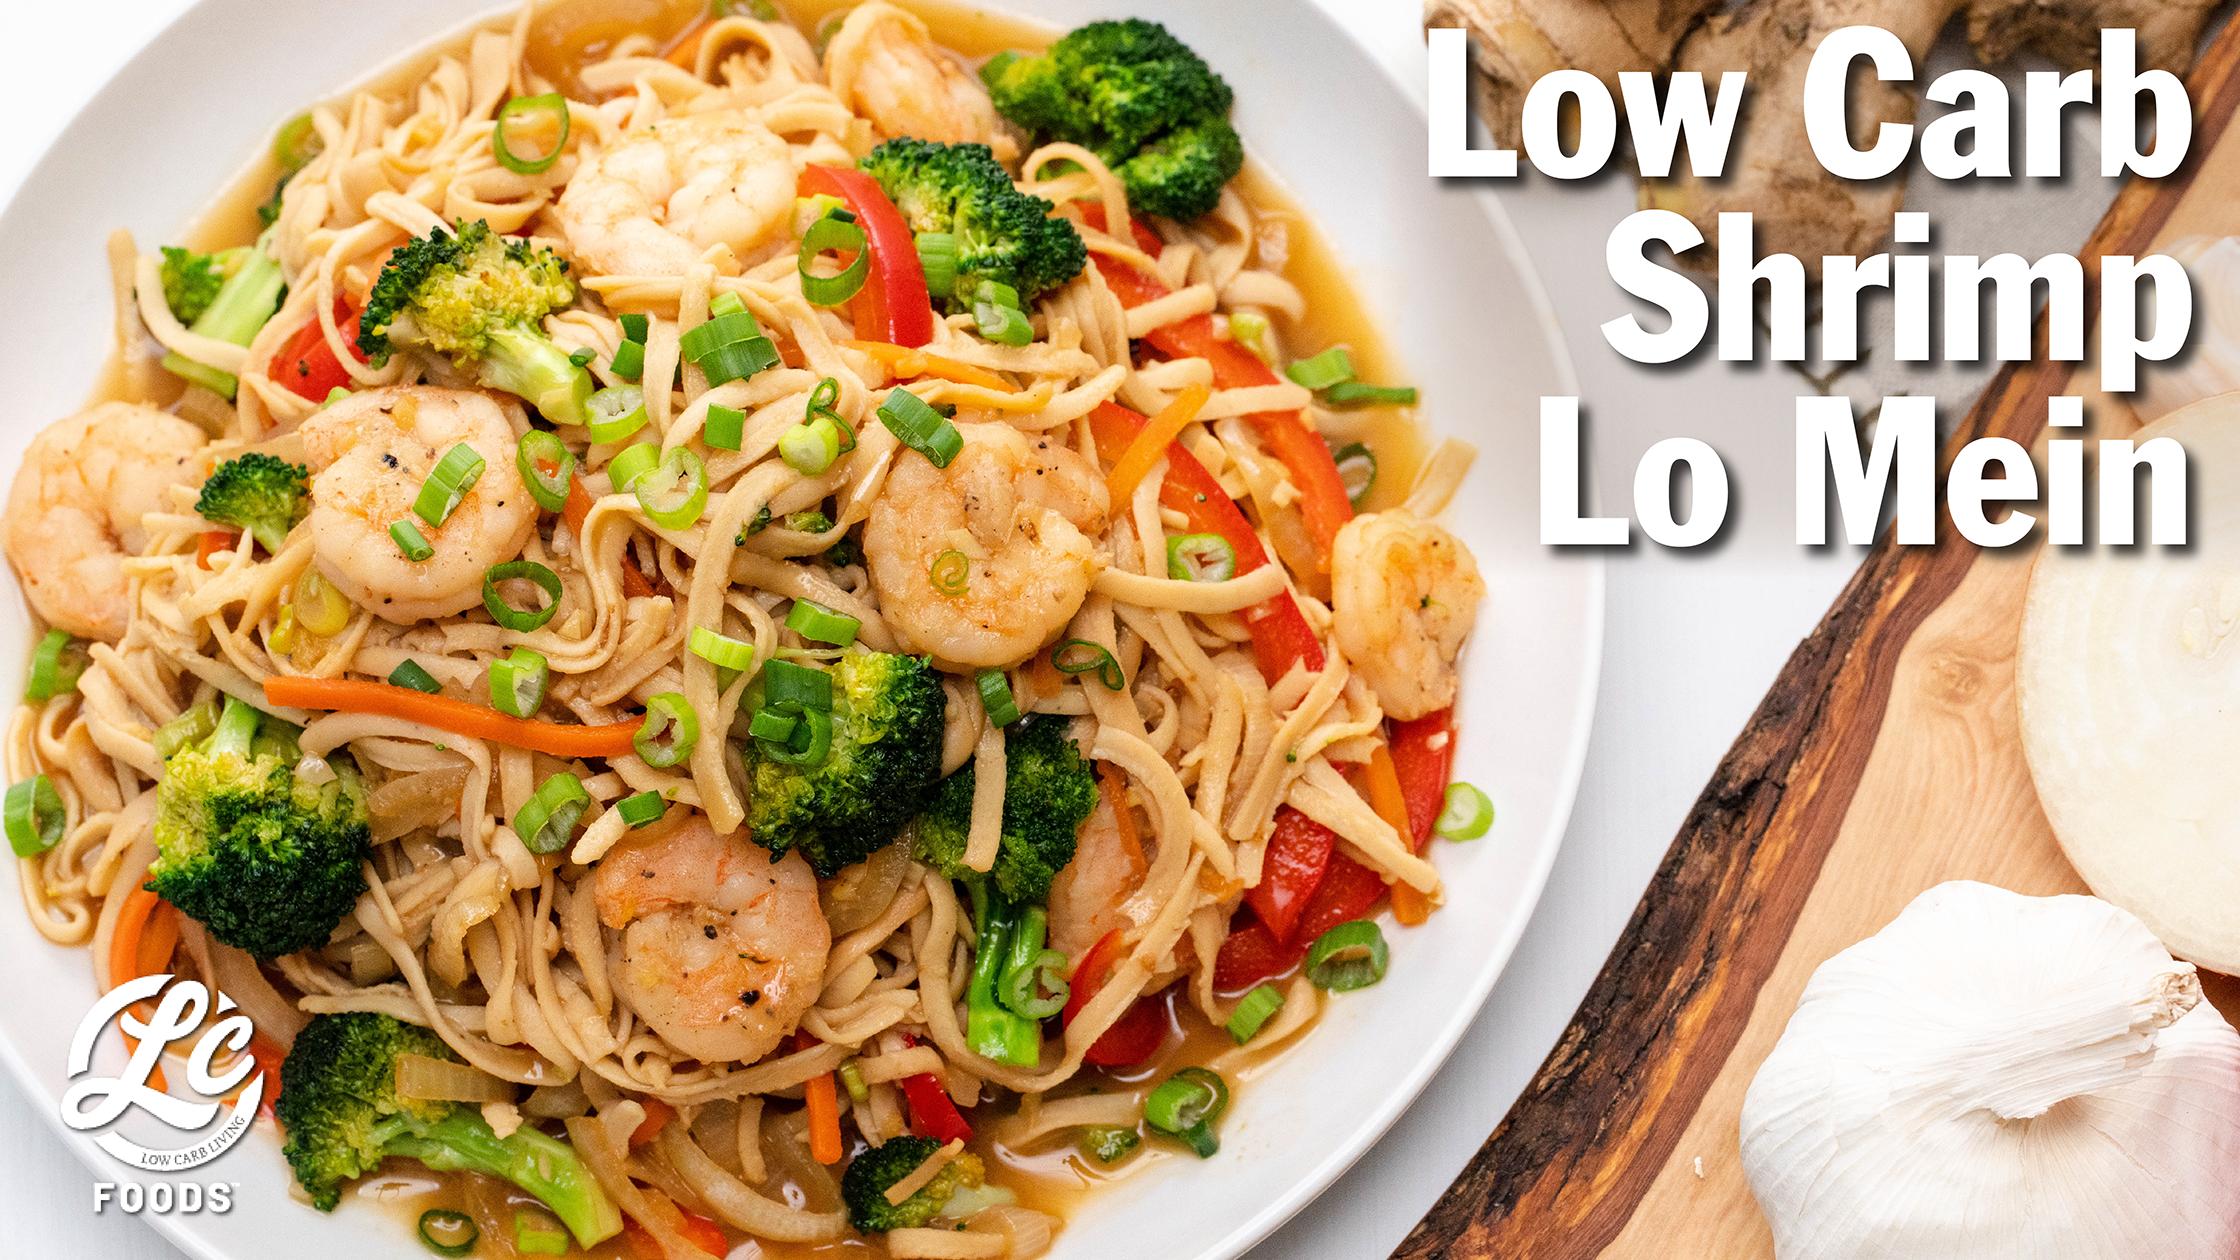 Thumbnail for Low Carb Shrimp Lo Mein